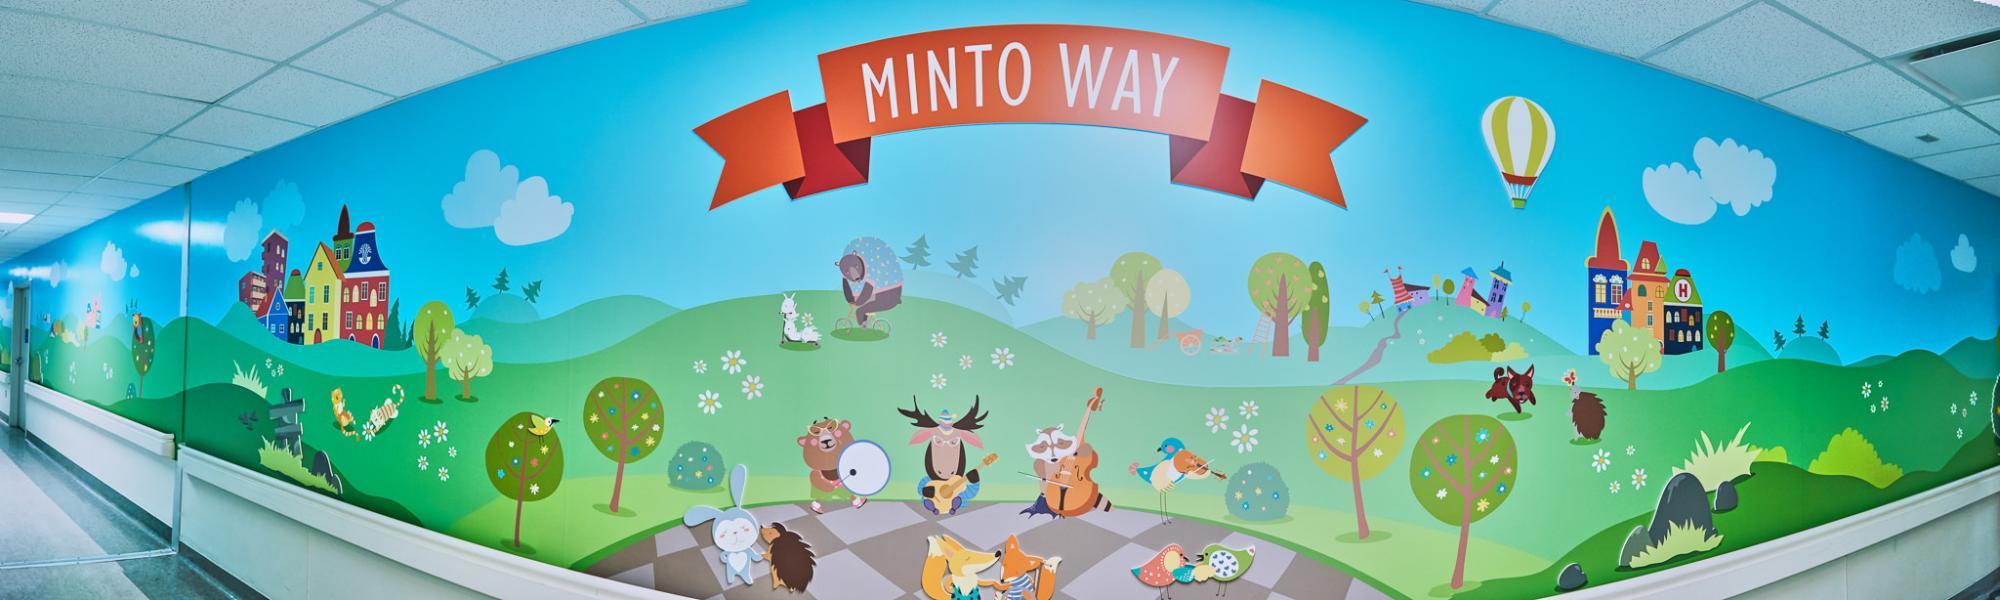 The Minto Way hallway dedication at CHEO